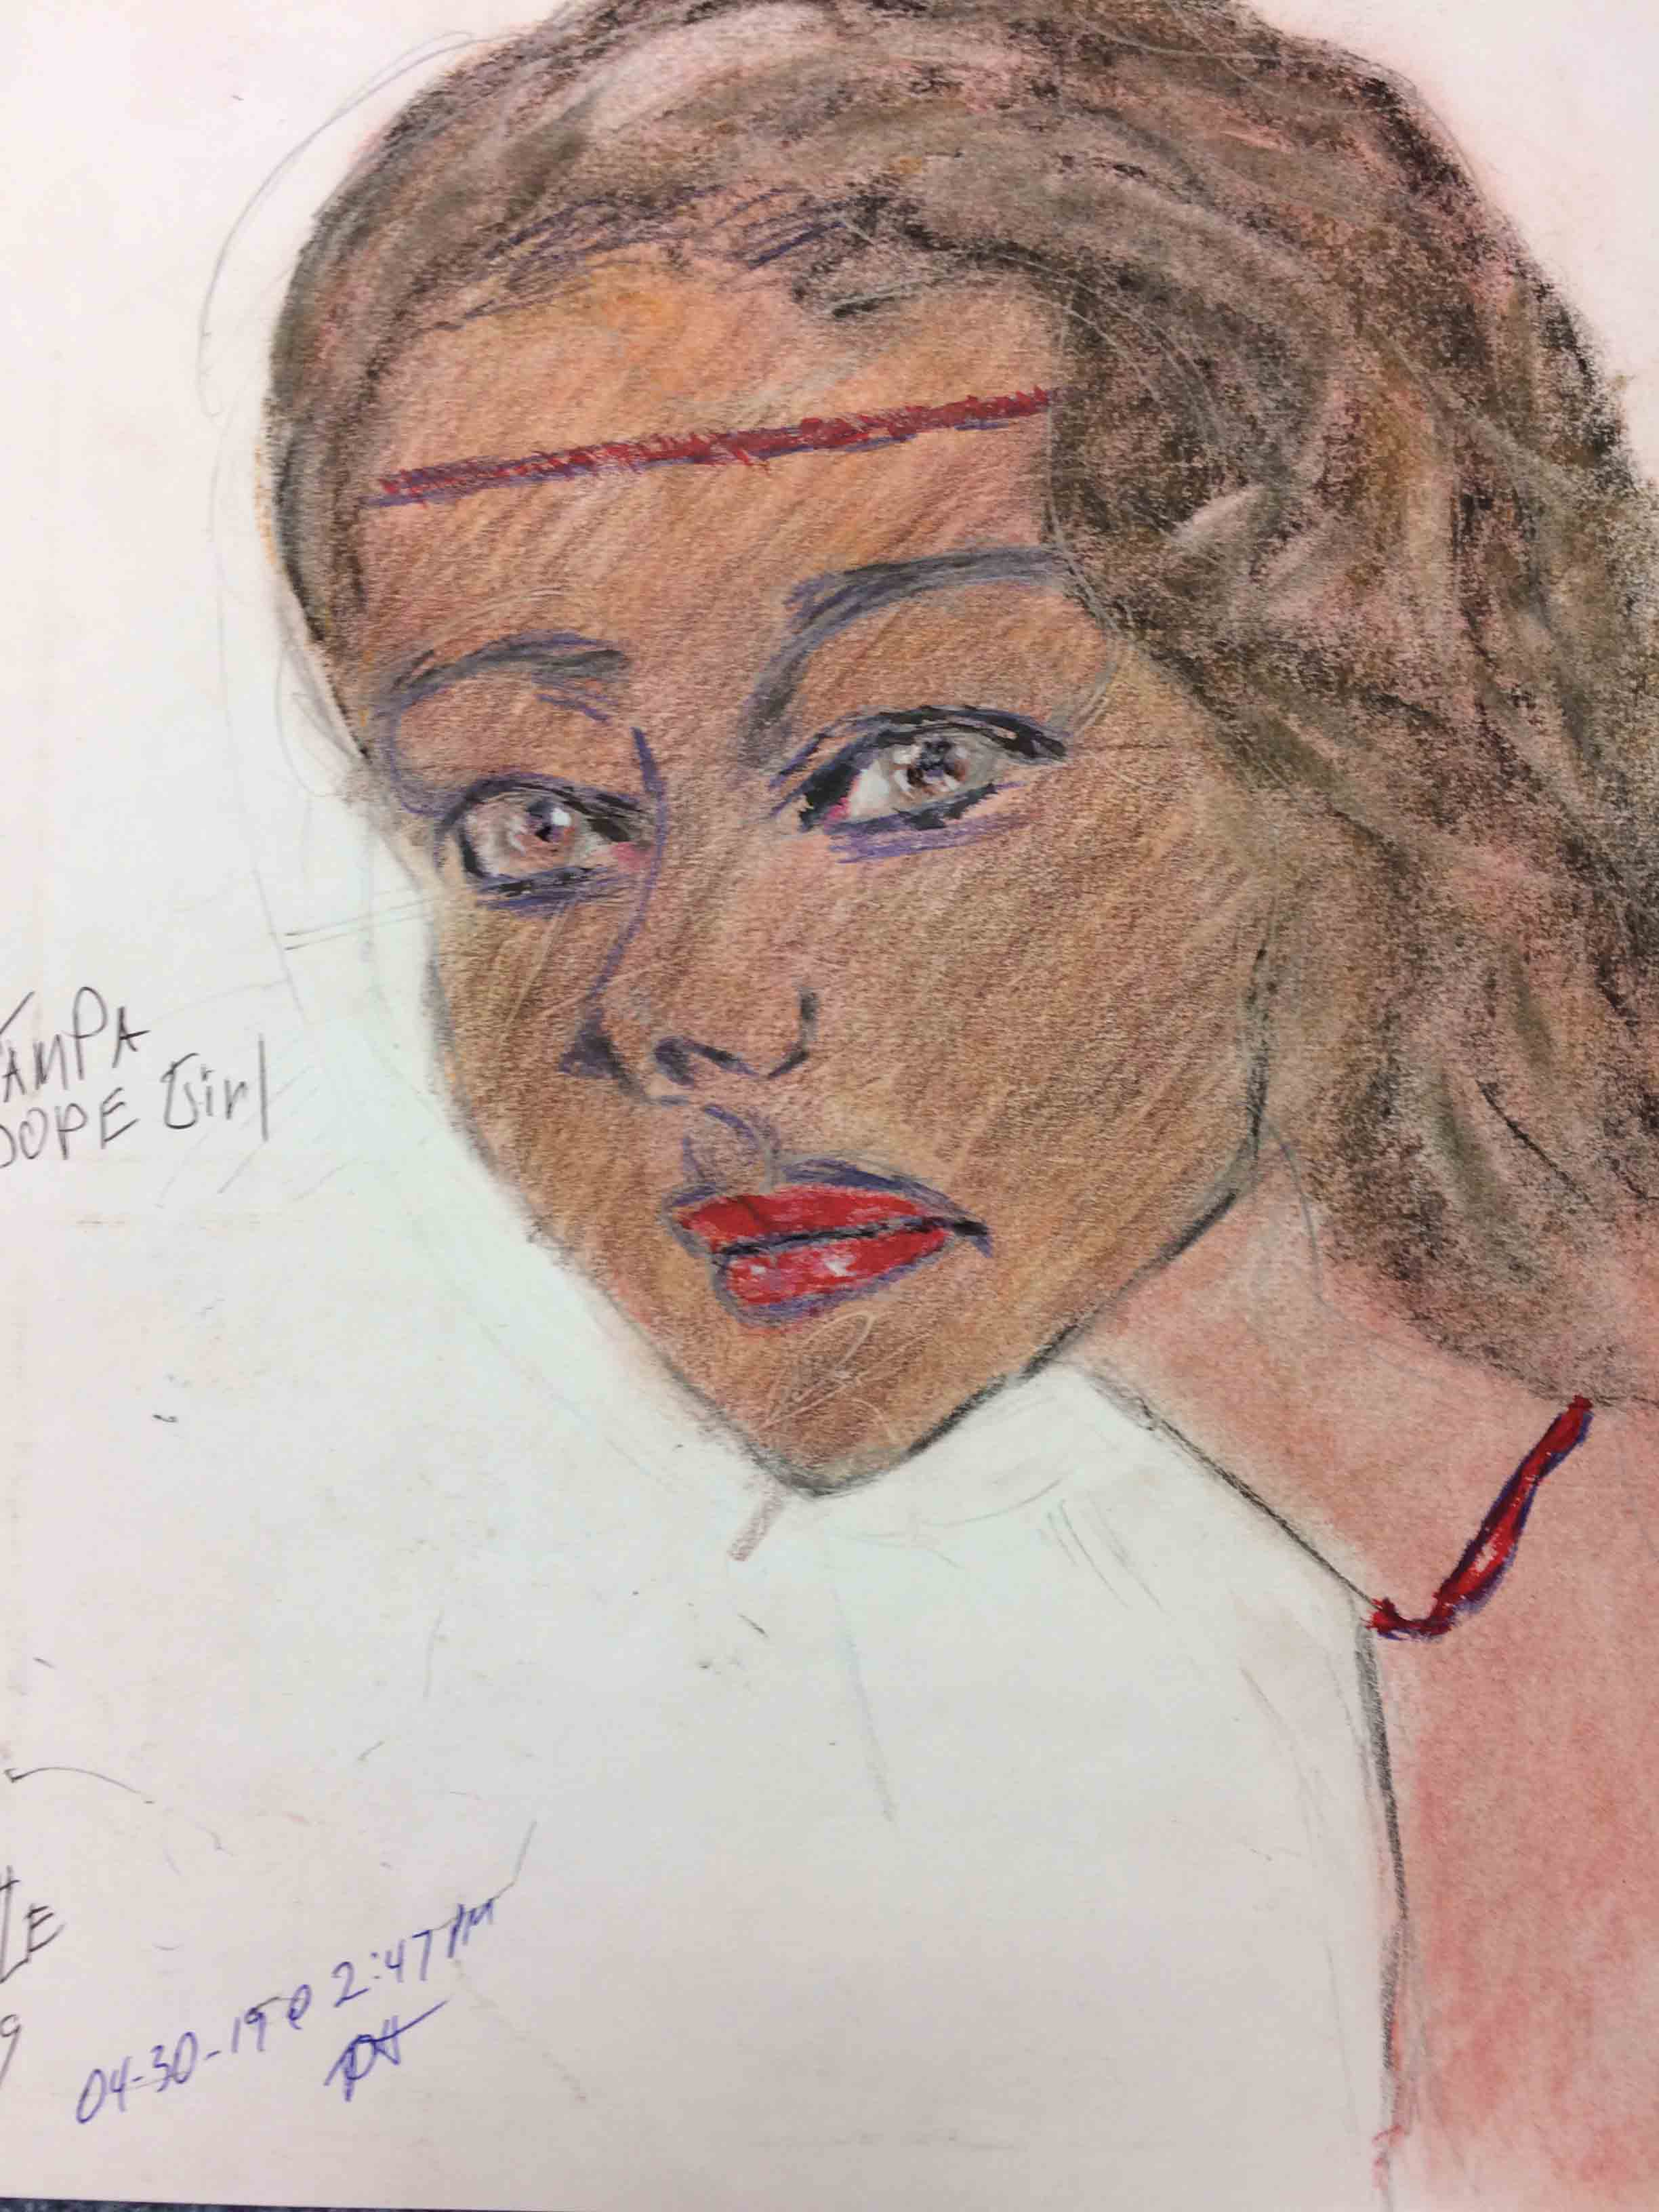 Samuel Little Drawing of Black Female Victim (Killed in 1984, Tampa Bay, Florida)